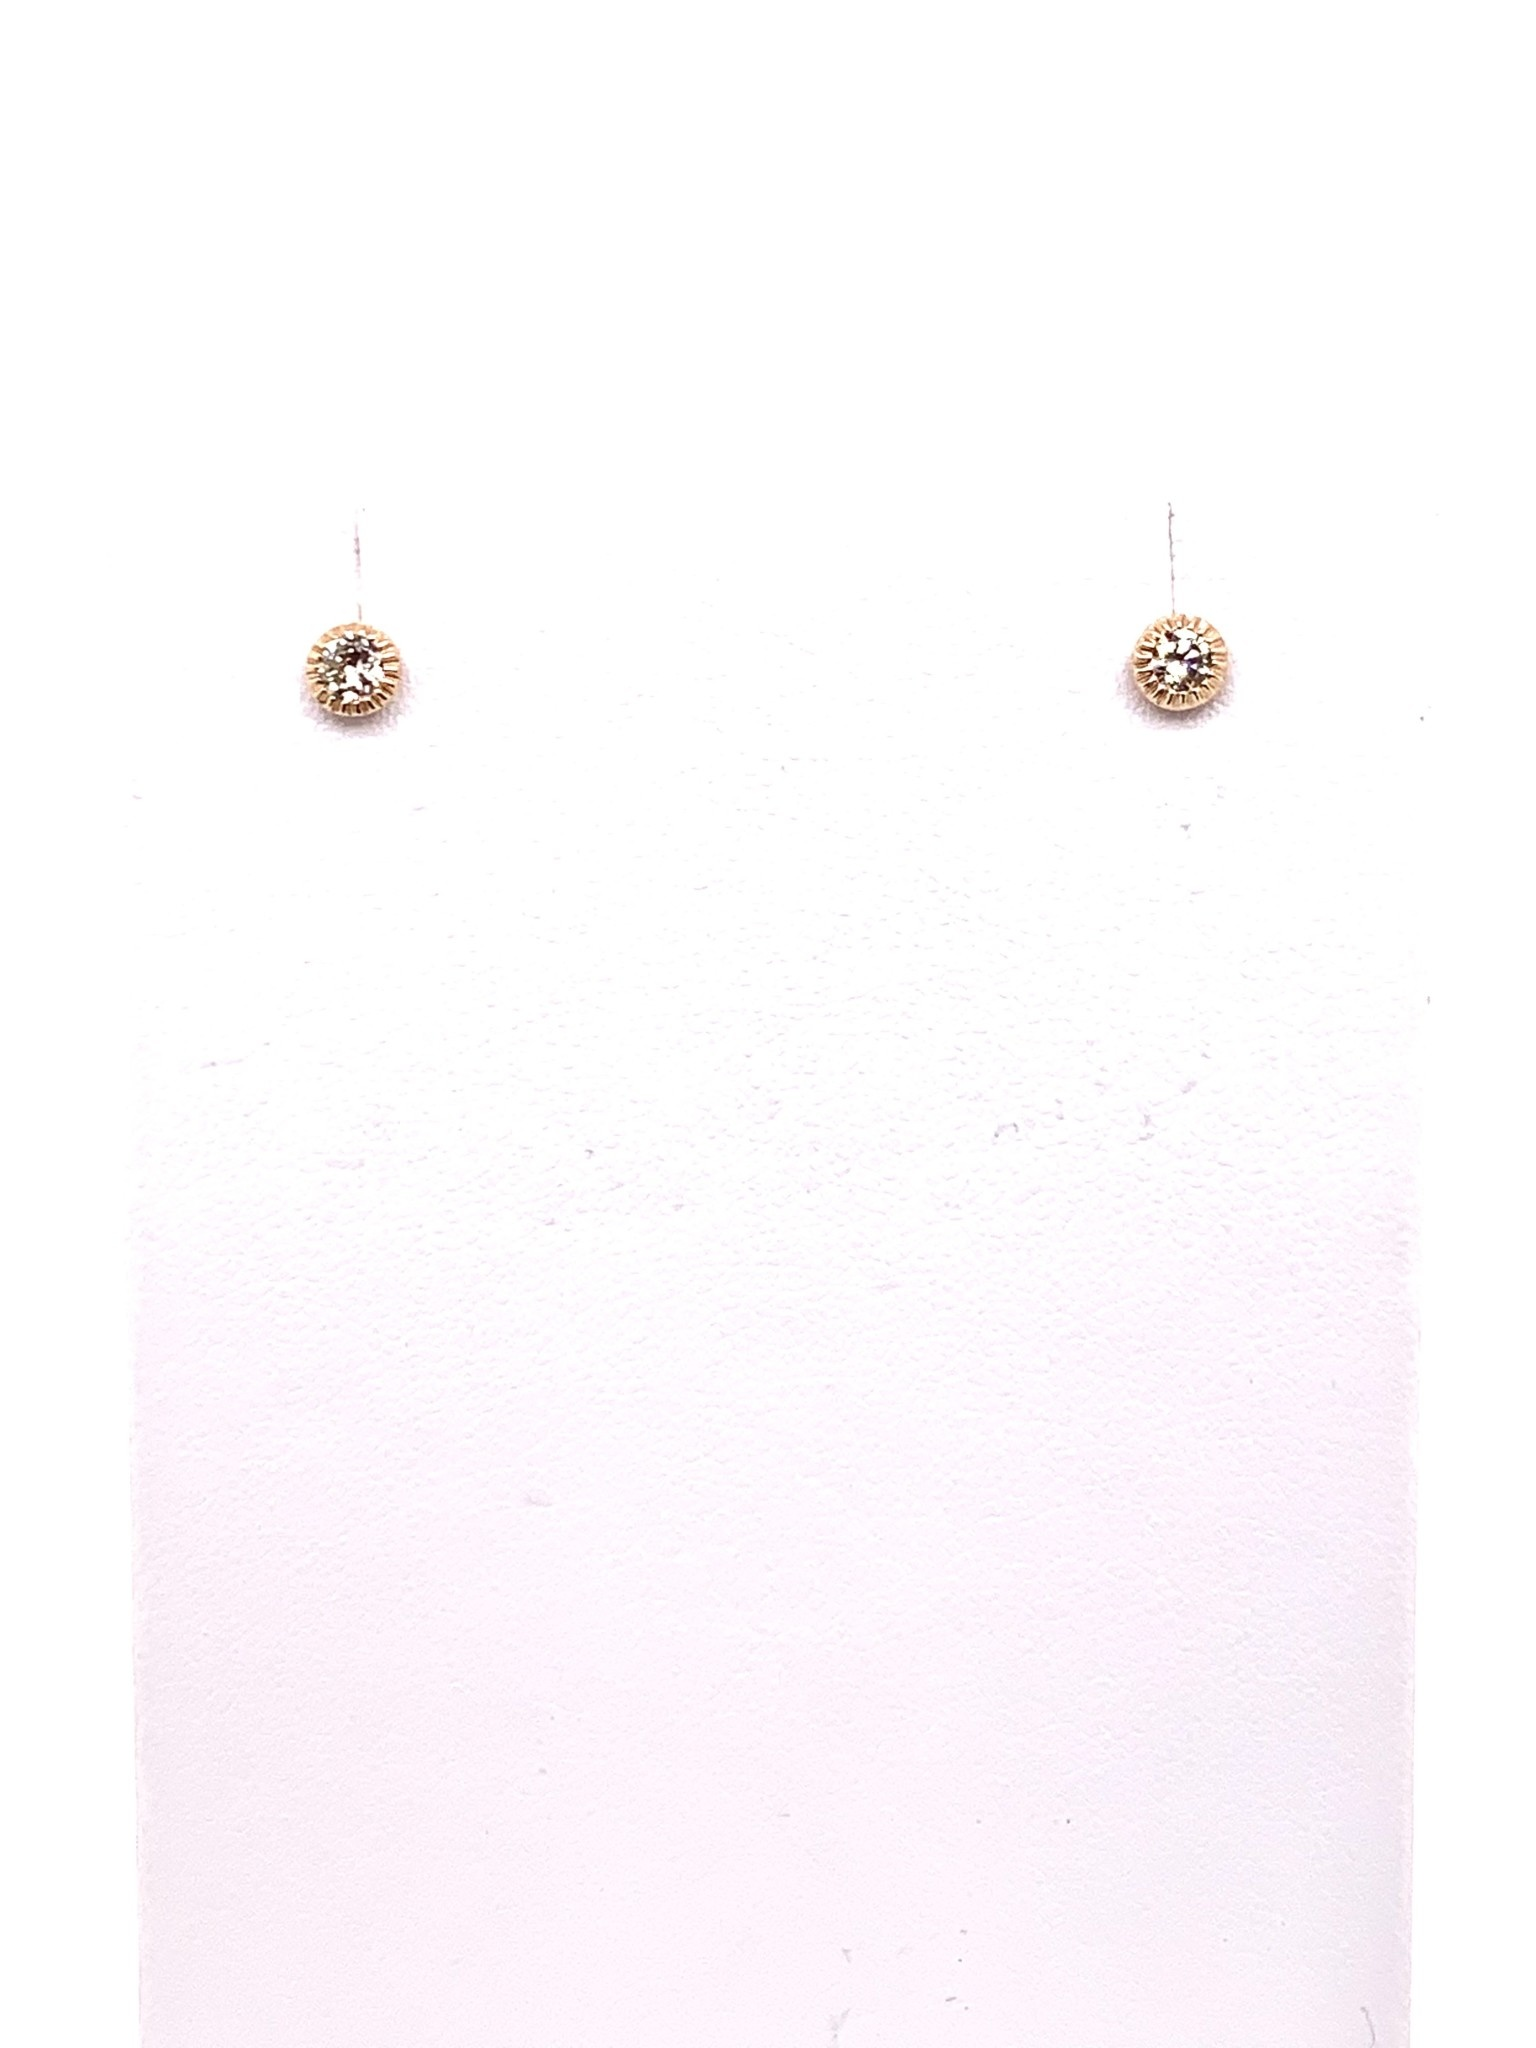 14K rose gold 0.25ct diamond stud earrings with filigree